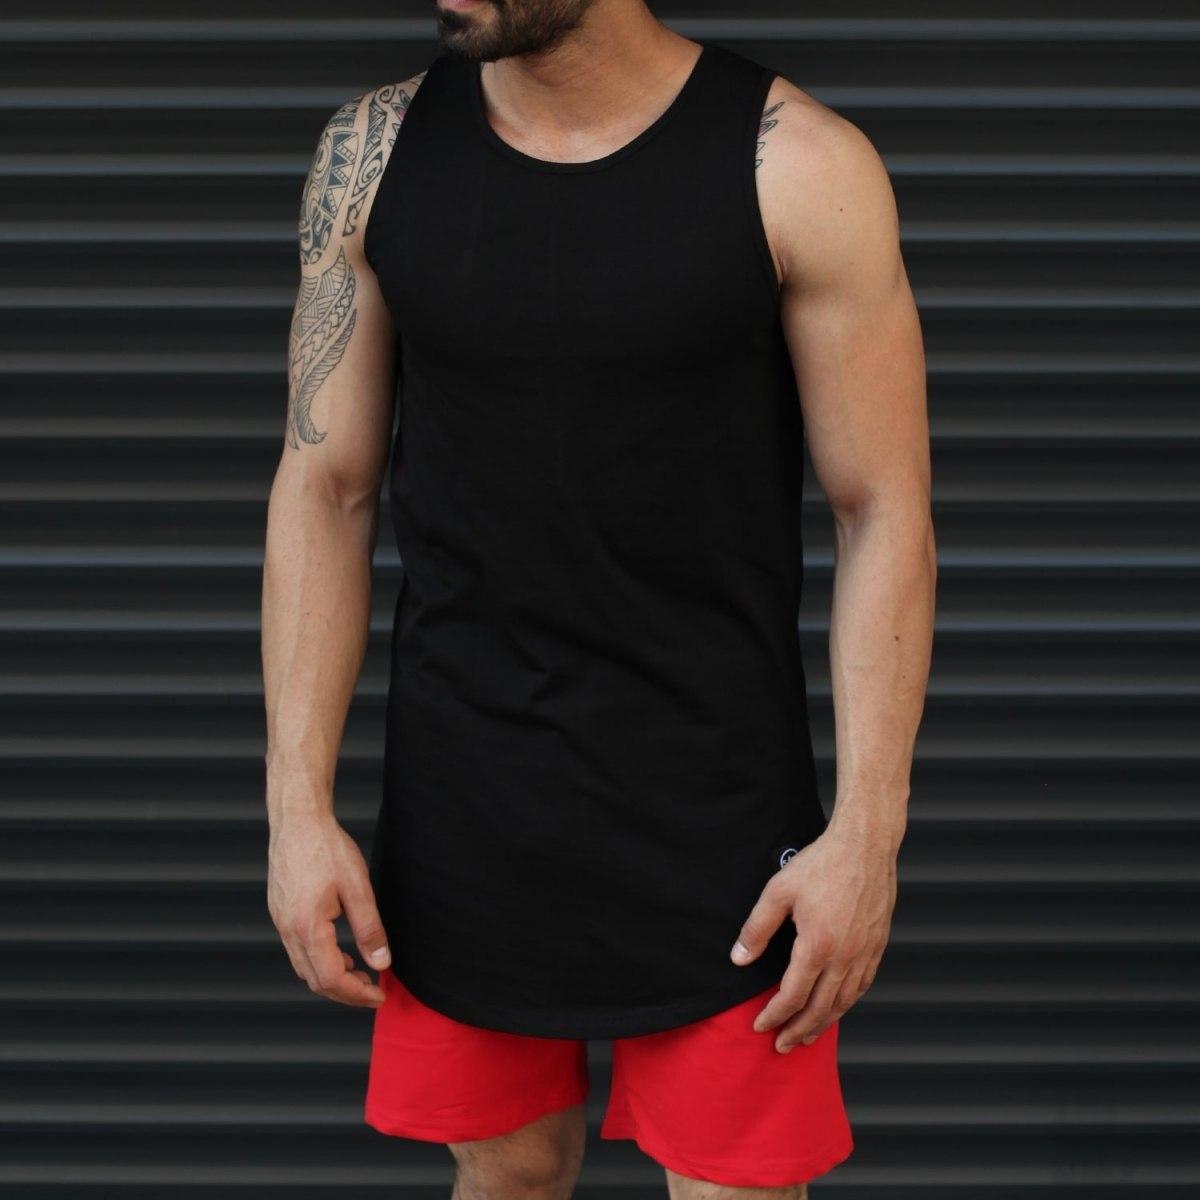 Men's Athletic Sleeveless Tall Tank Top Black Mv Premium Brand - 1